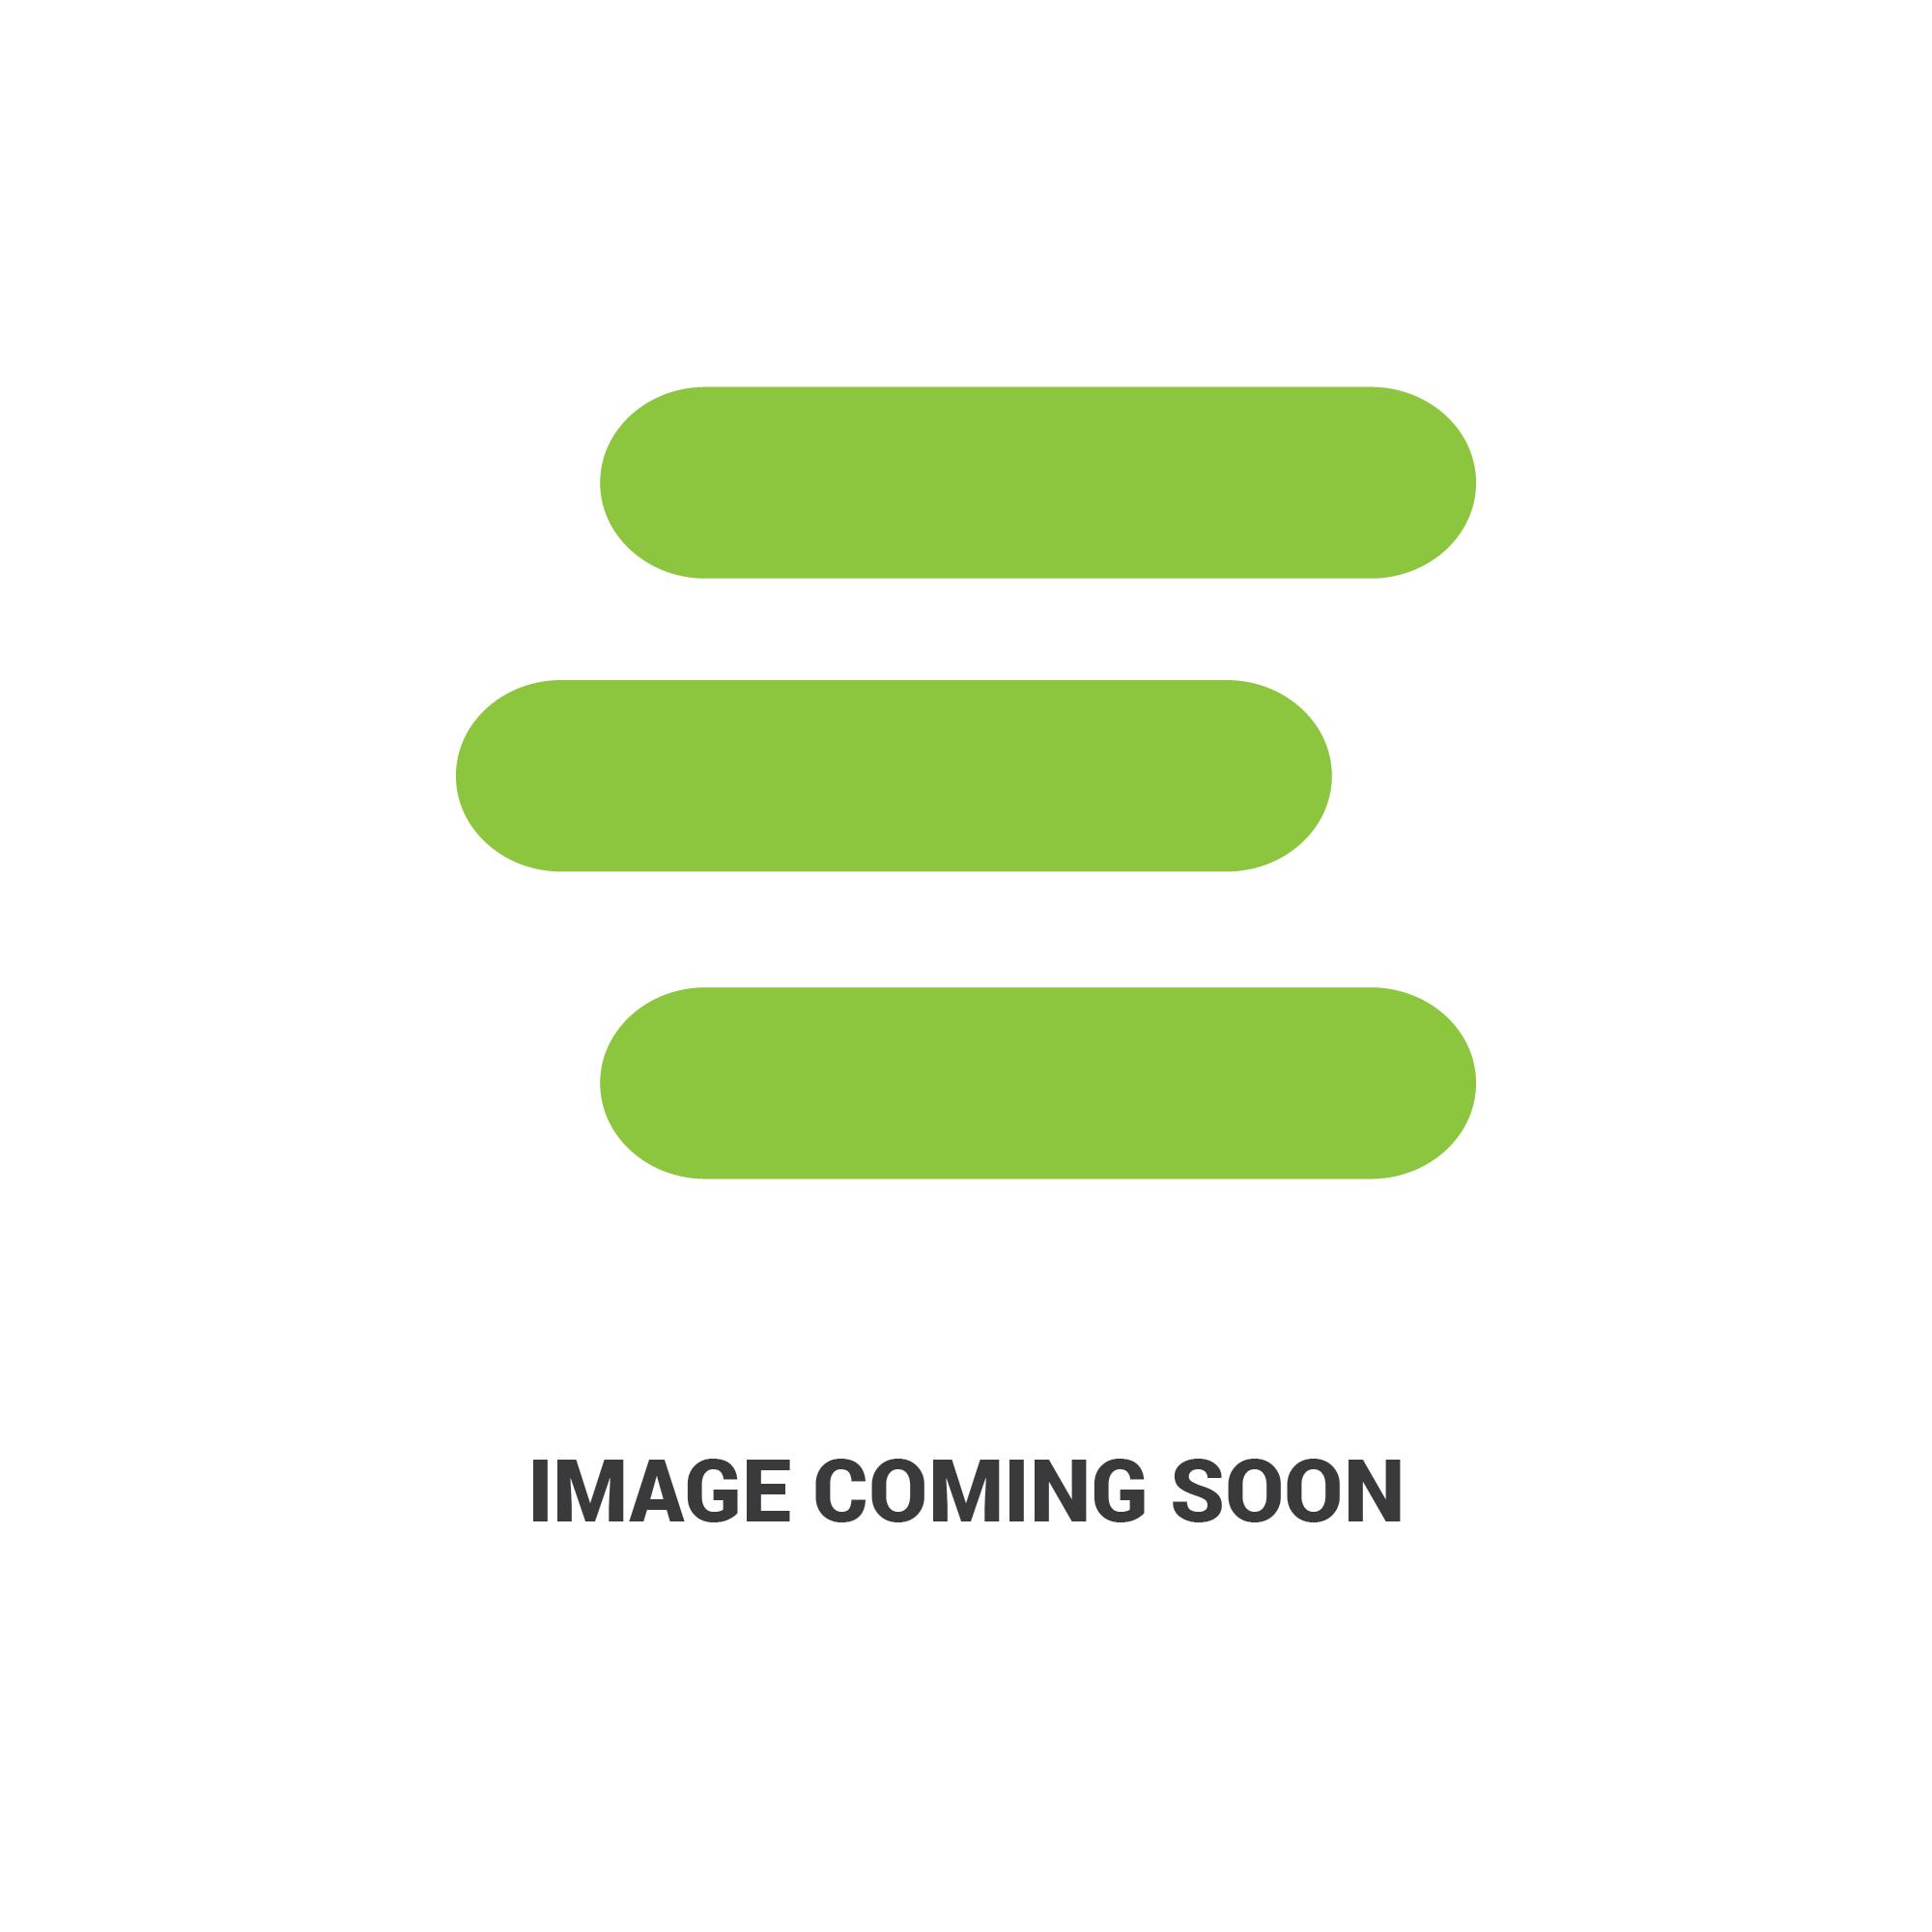 E-113268edit 3.jpg